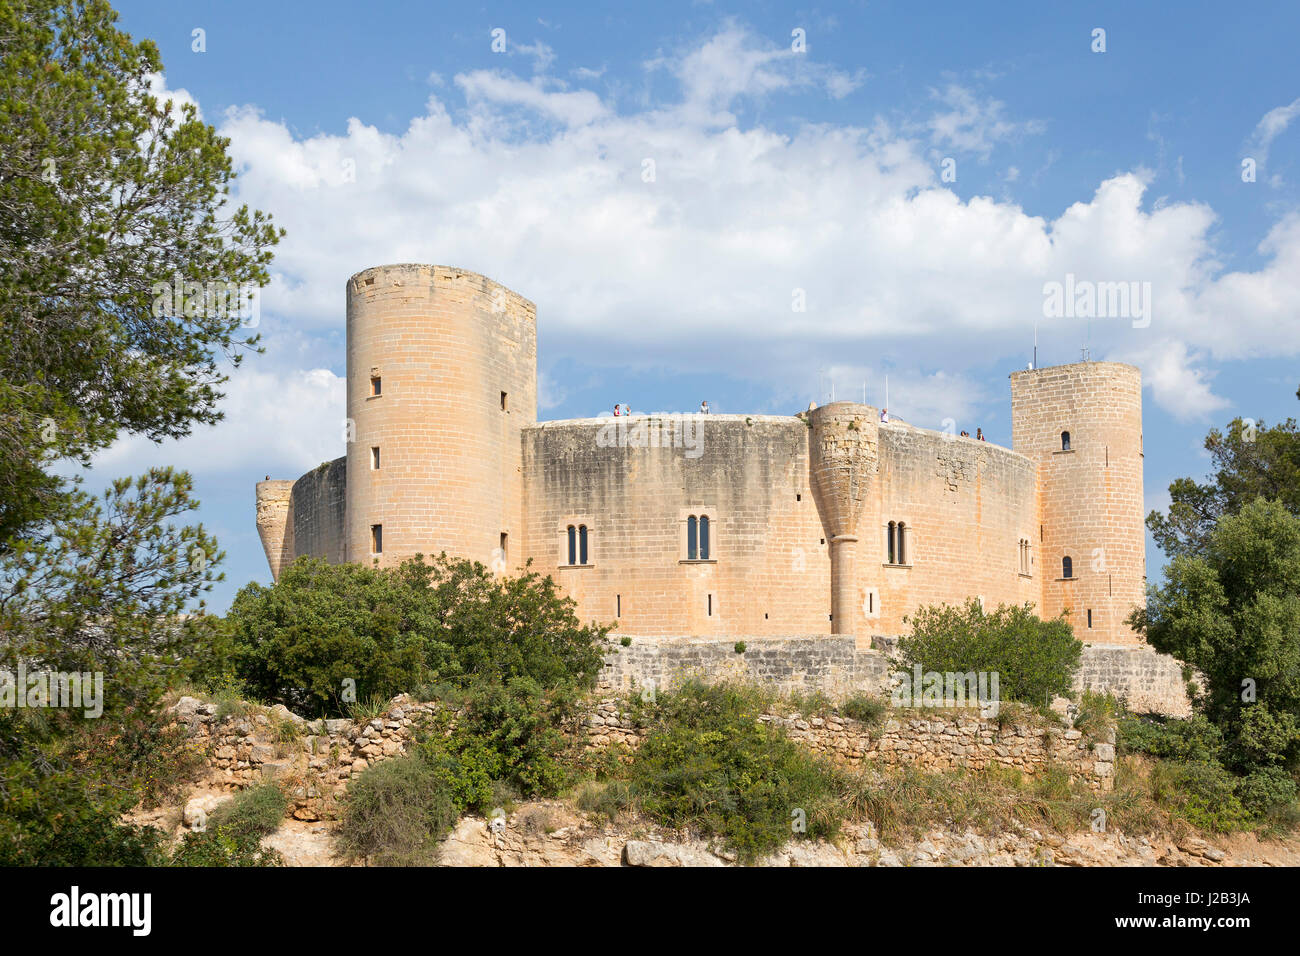 Castell de Bellver à Palma de Majorque, Espagne Photo Stock